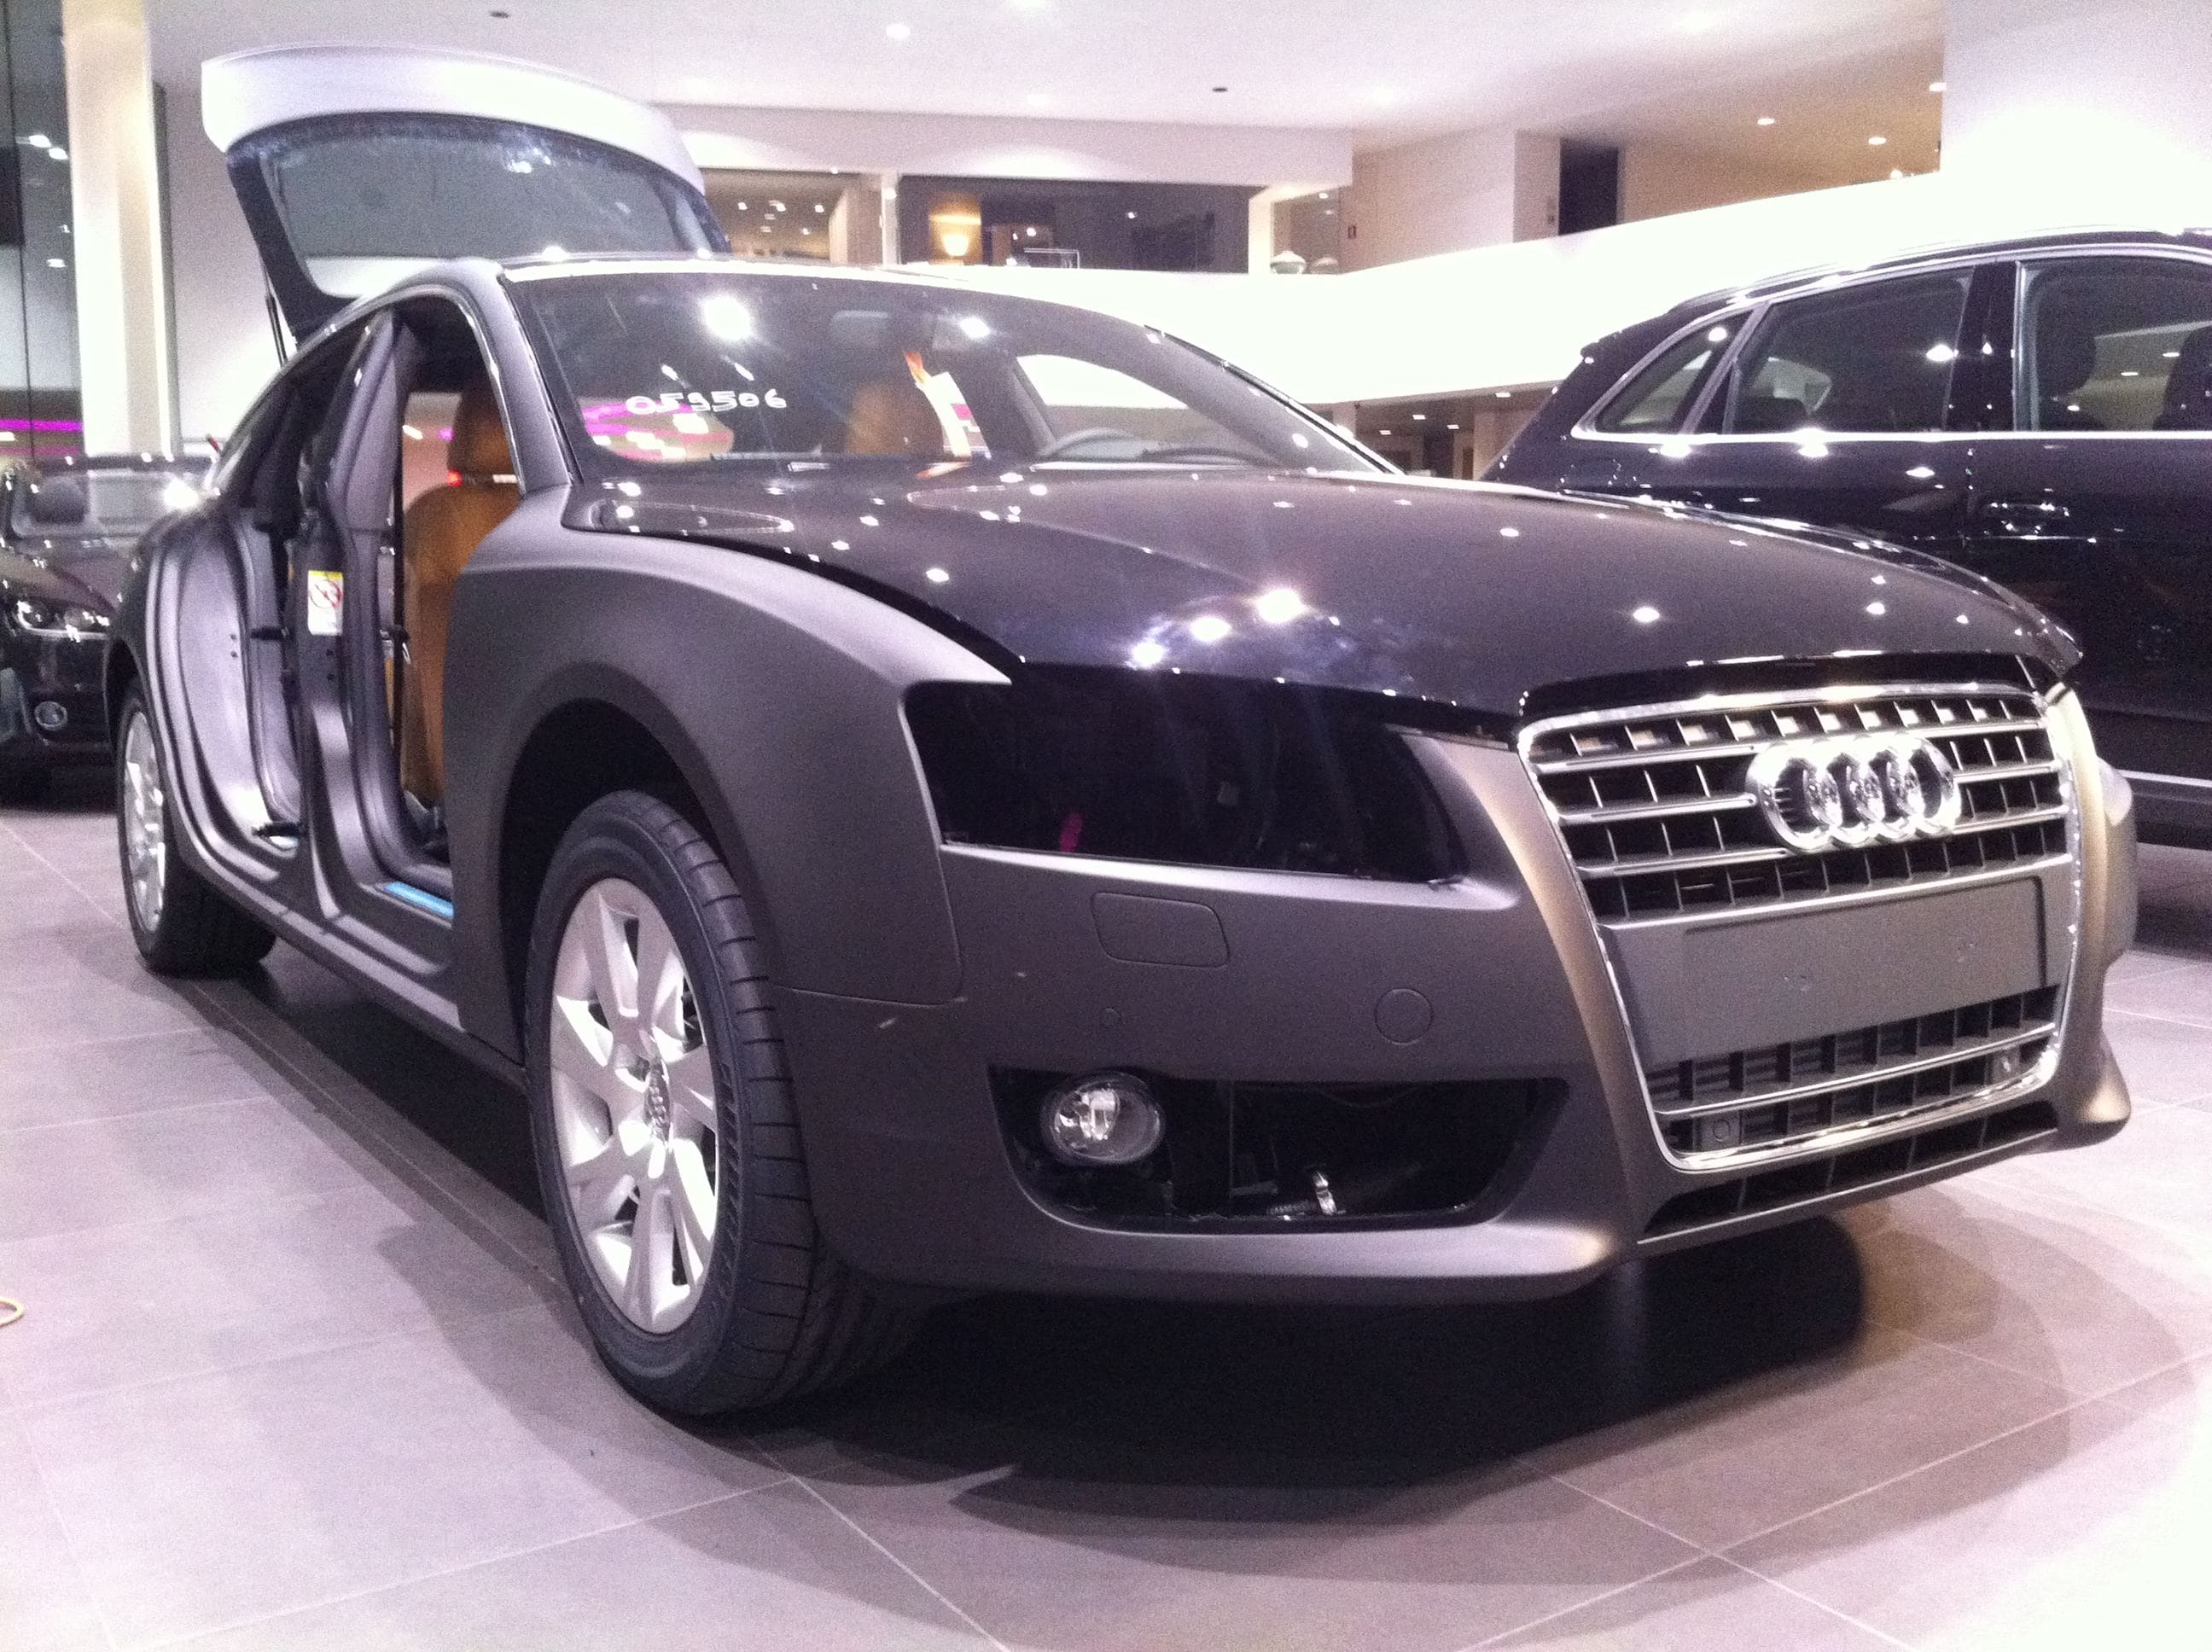 Audi A5 Sportback met Mat Grijze Wrap, Carwrapping door Wrapmyride.nu Foto-nr:4773, ©2021